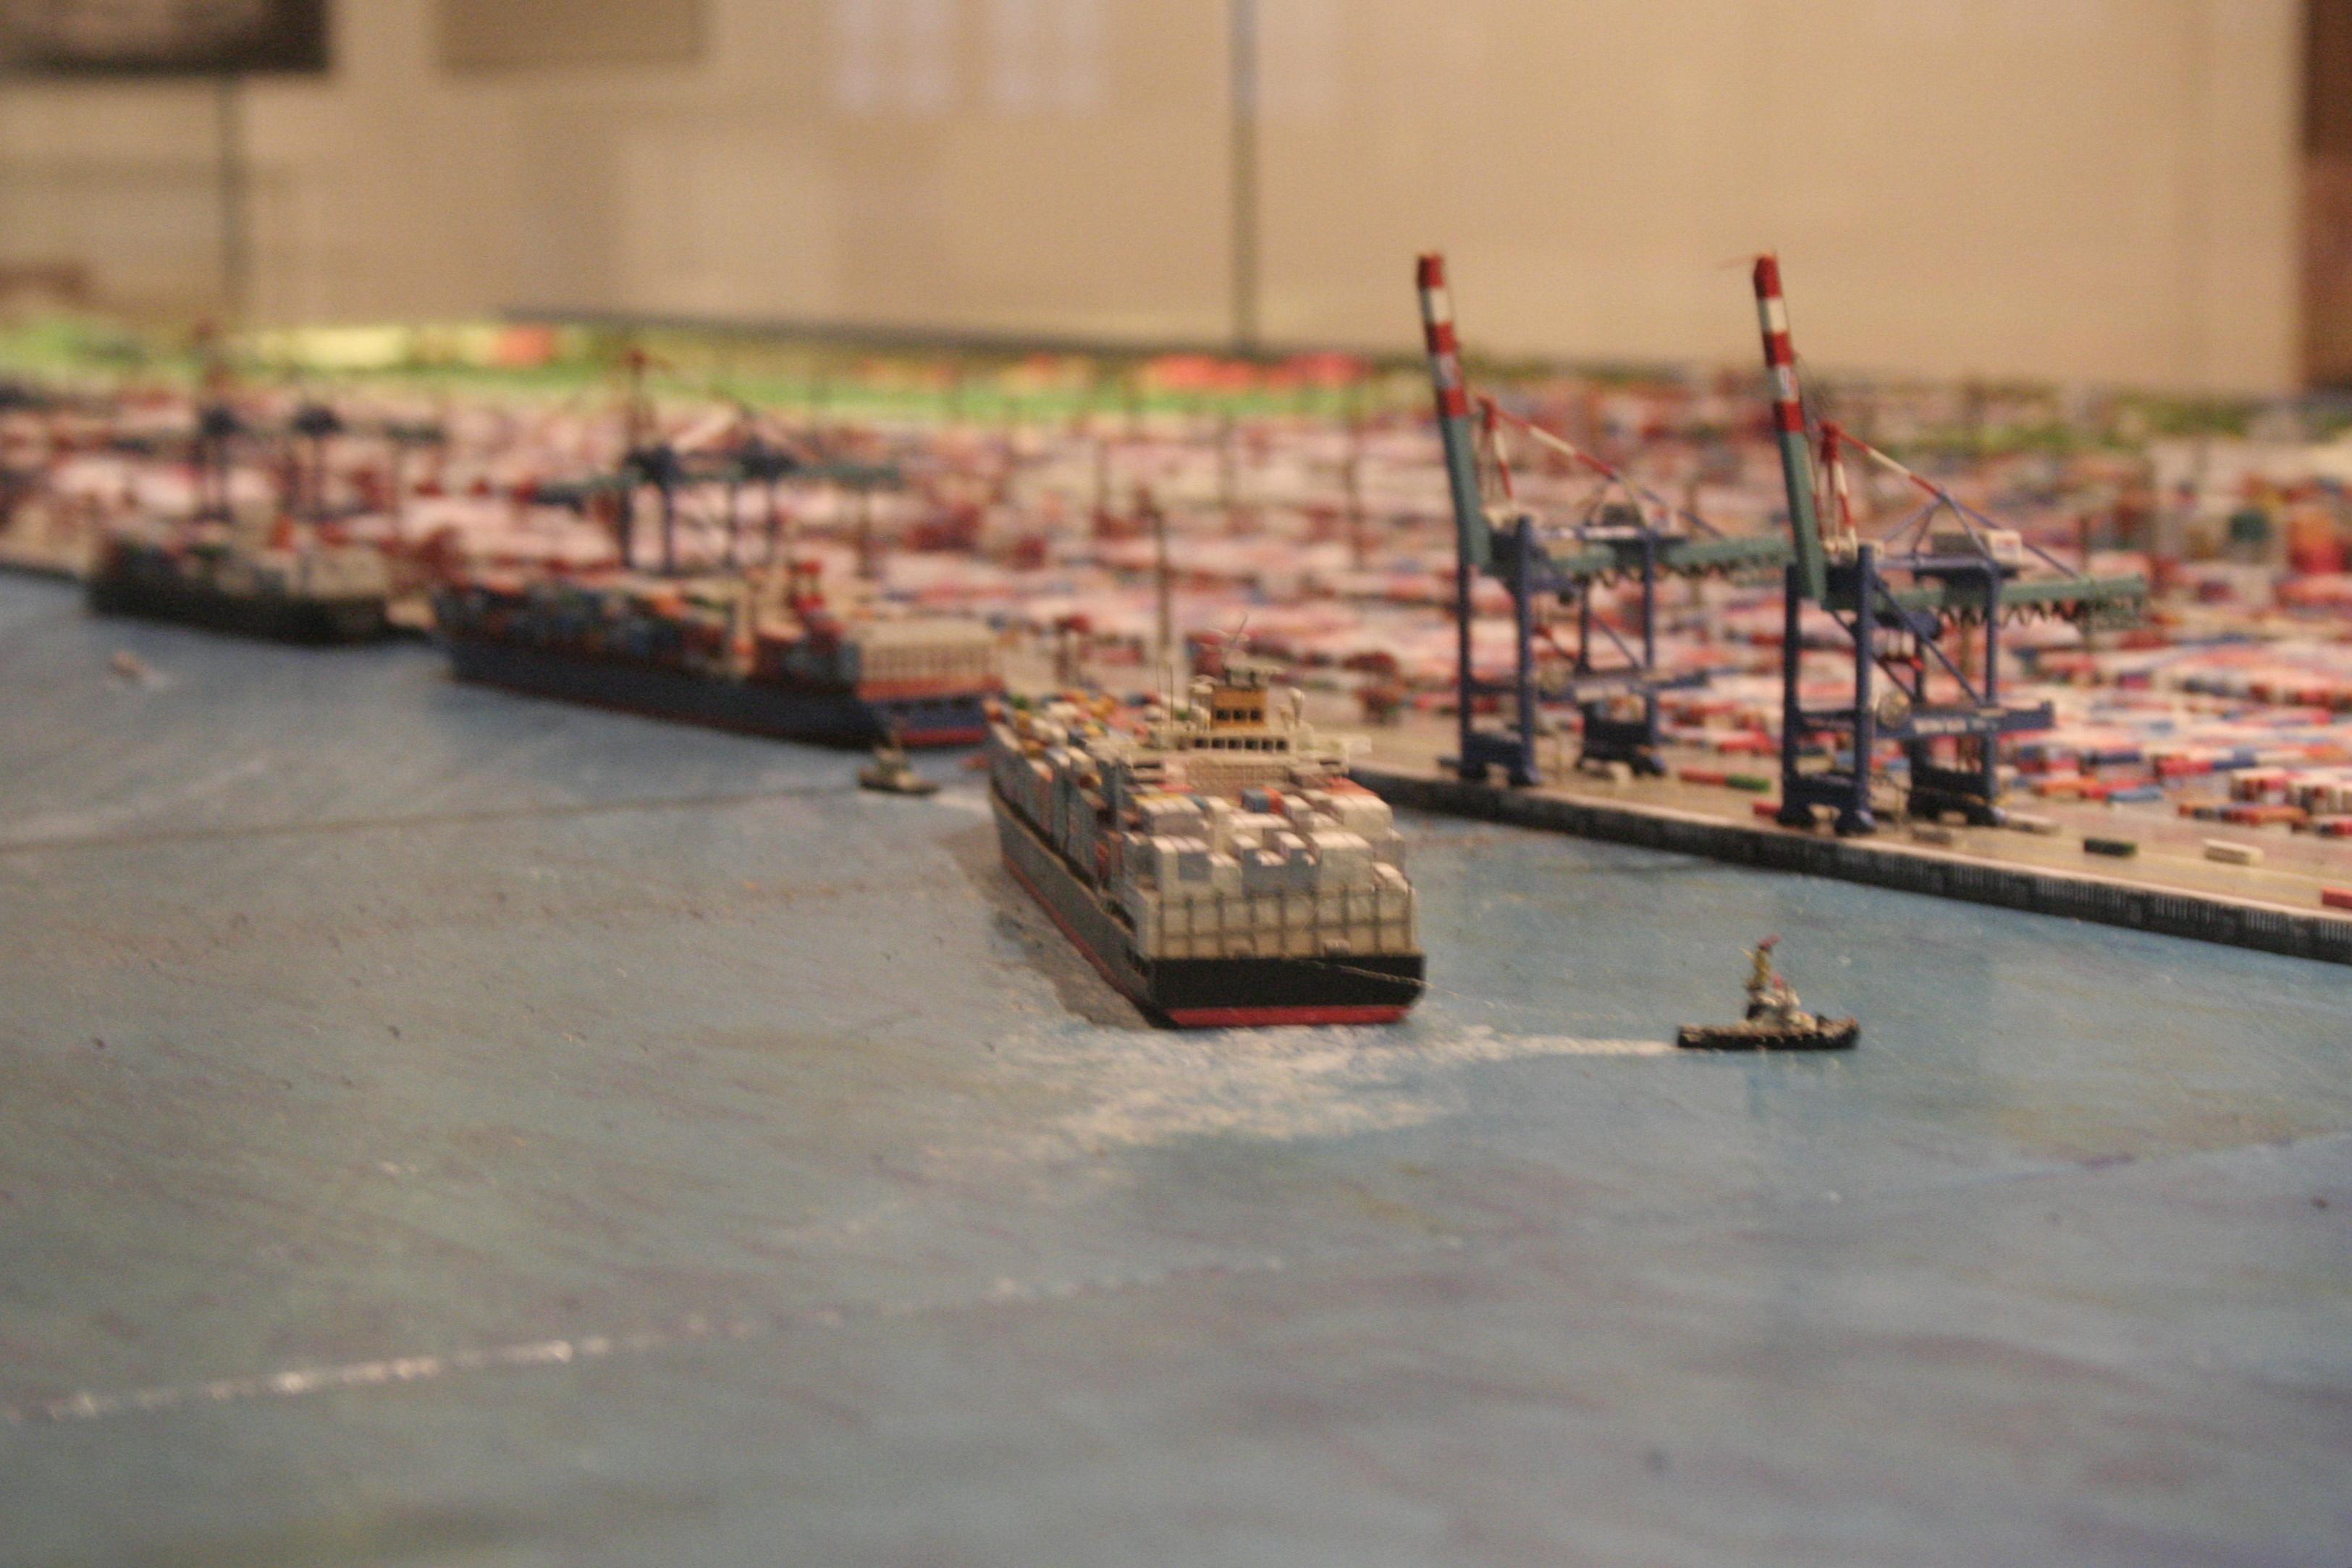 File:Harbour Model - Internationales Maritimes Museum Hamburg jpg